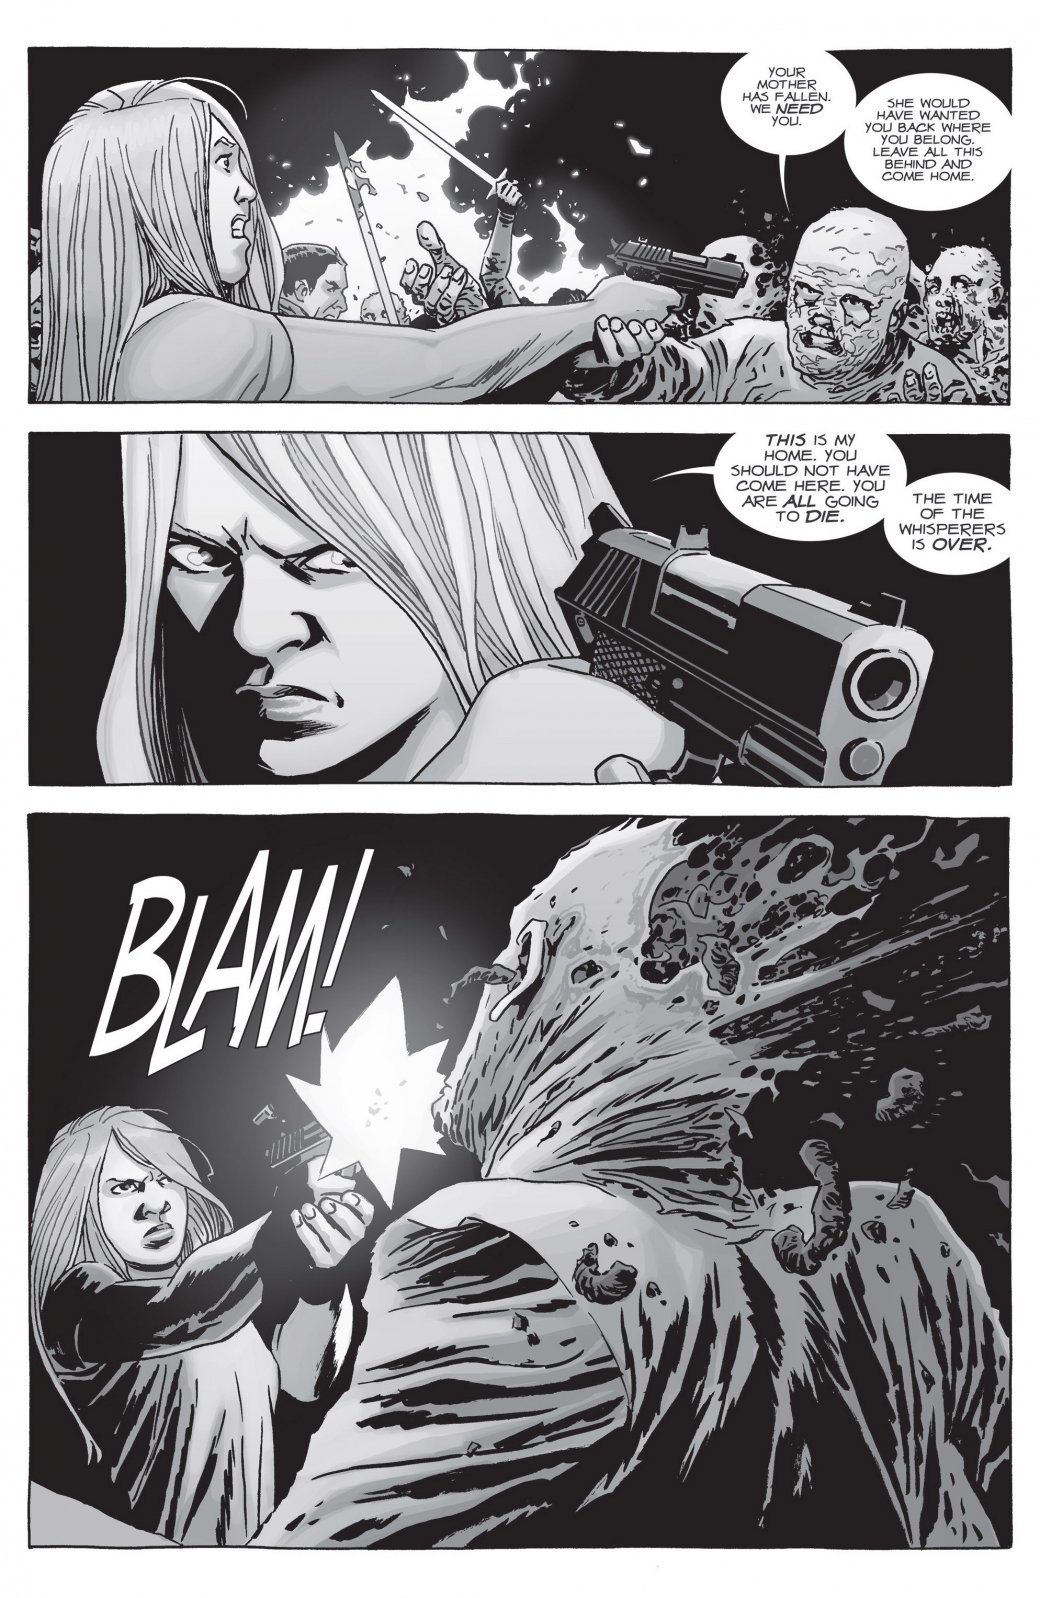 Война с Шепчущимися в комиксе The Walking Dead не оправдала ожиданий | Канобу - Изображение 22